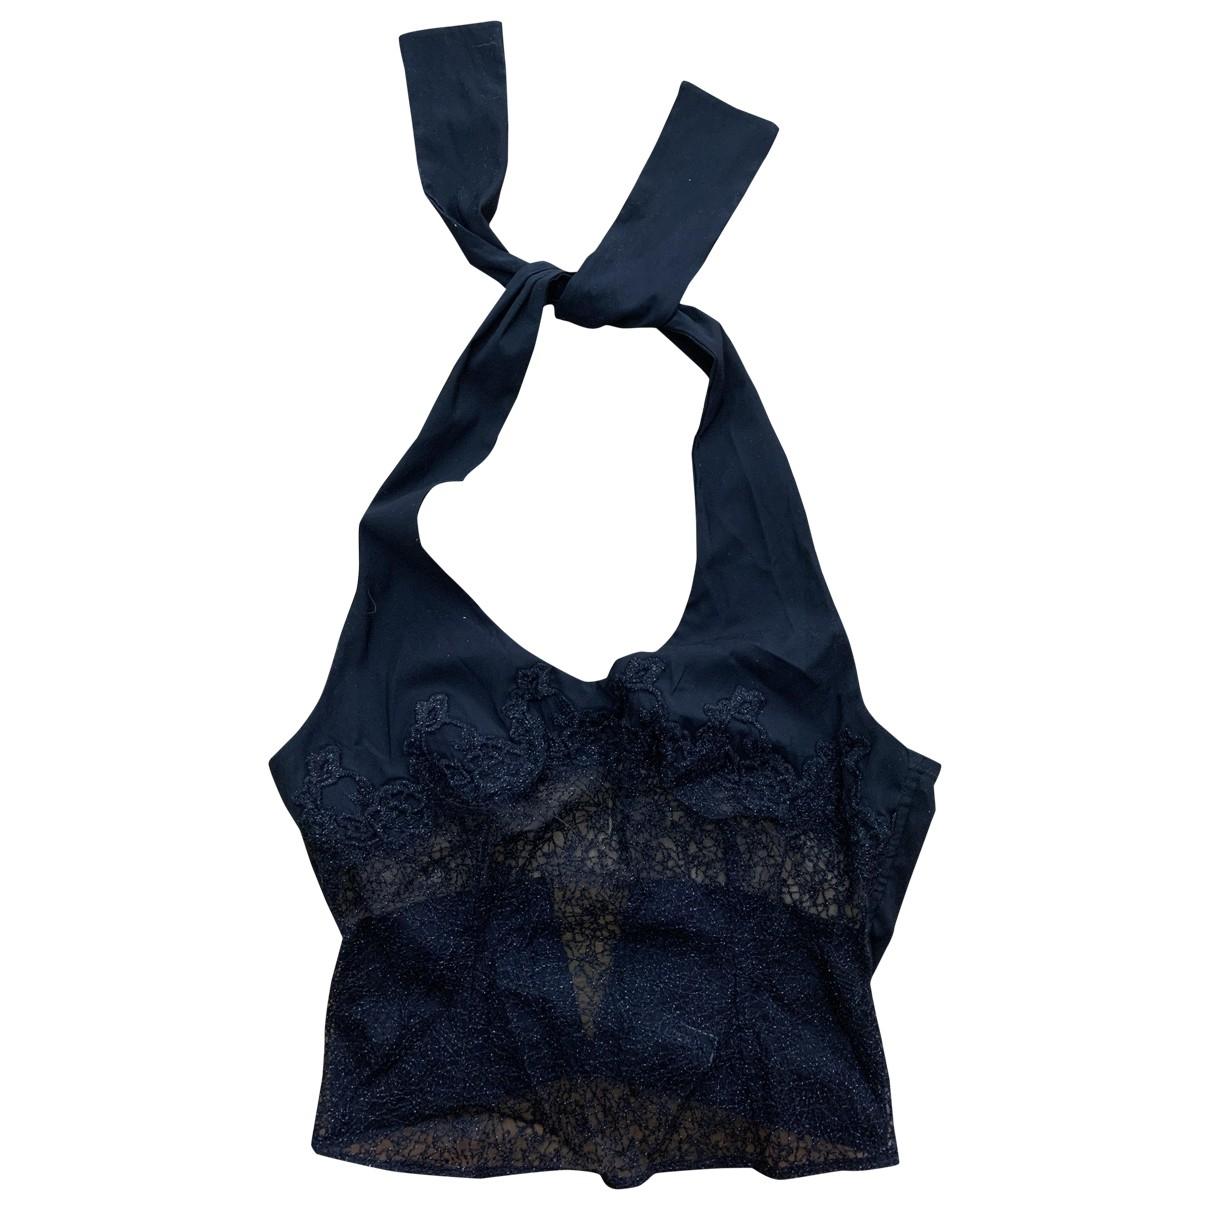 La Perla \N Top in  Schwarz Polyester